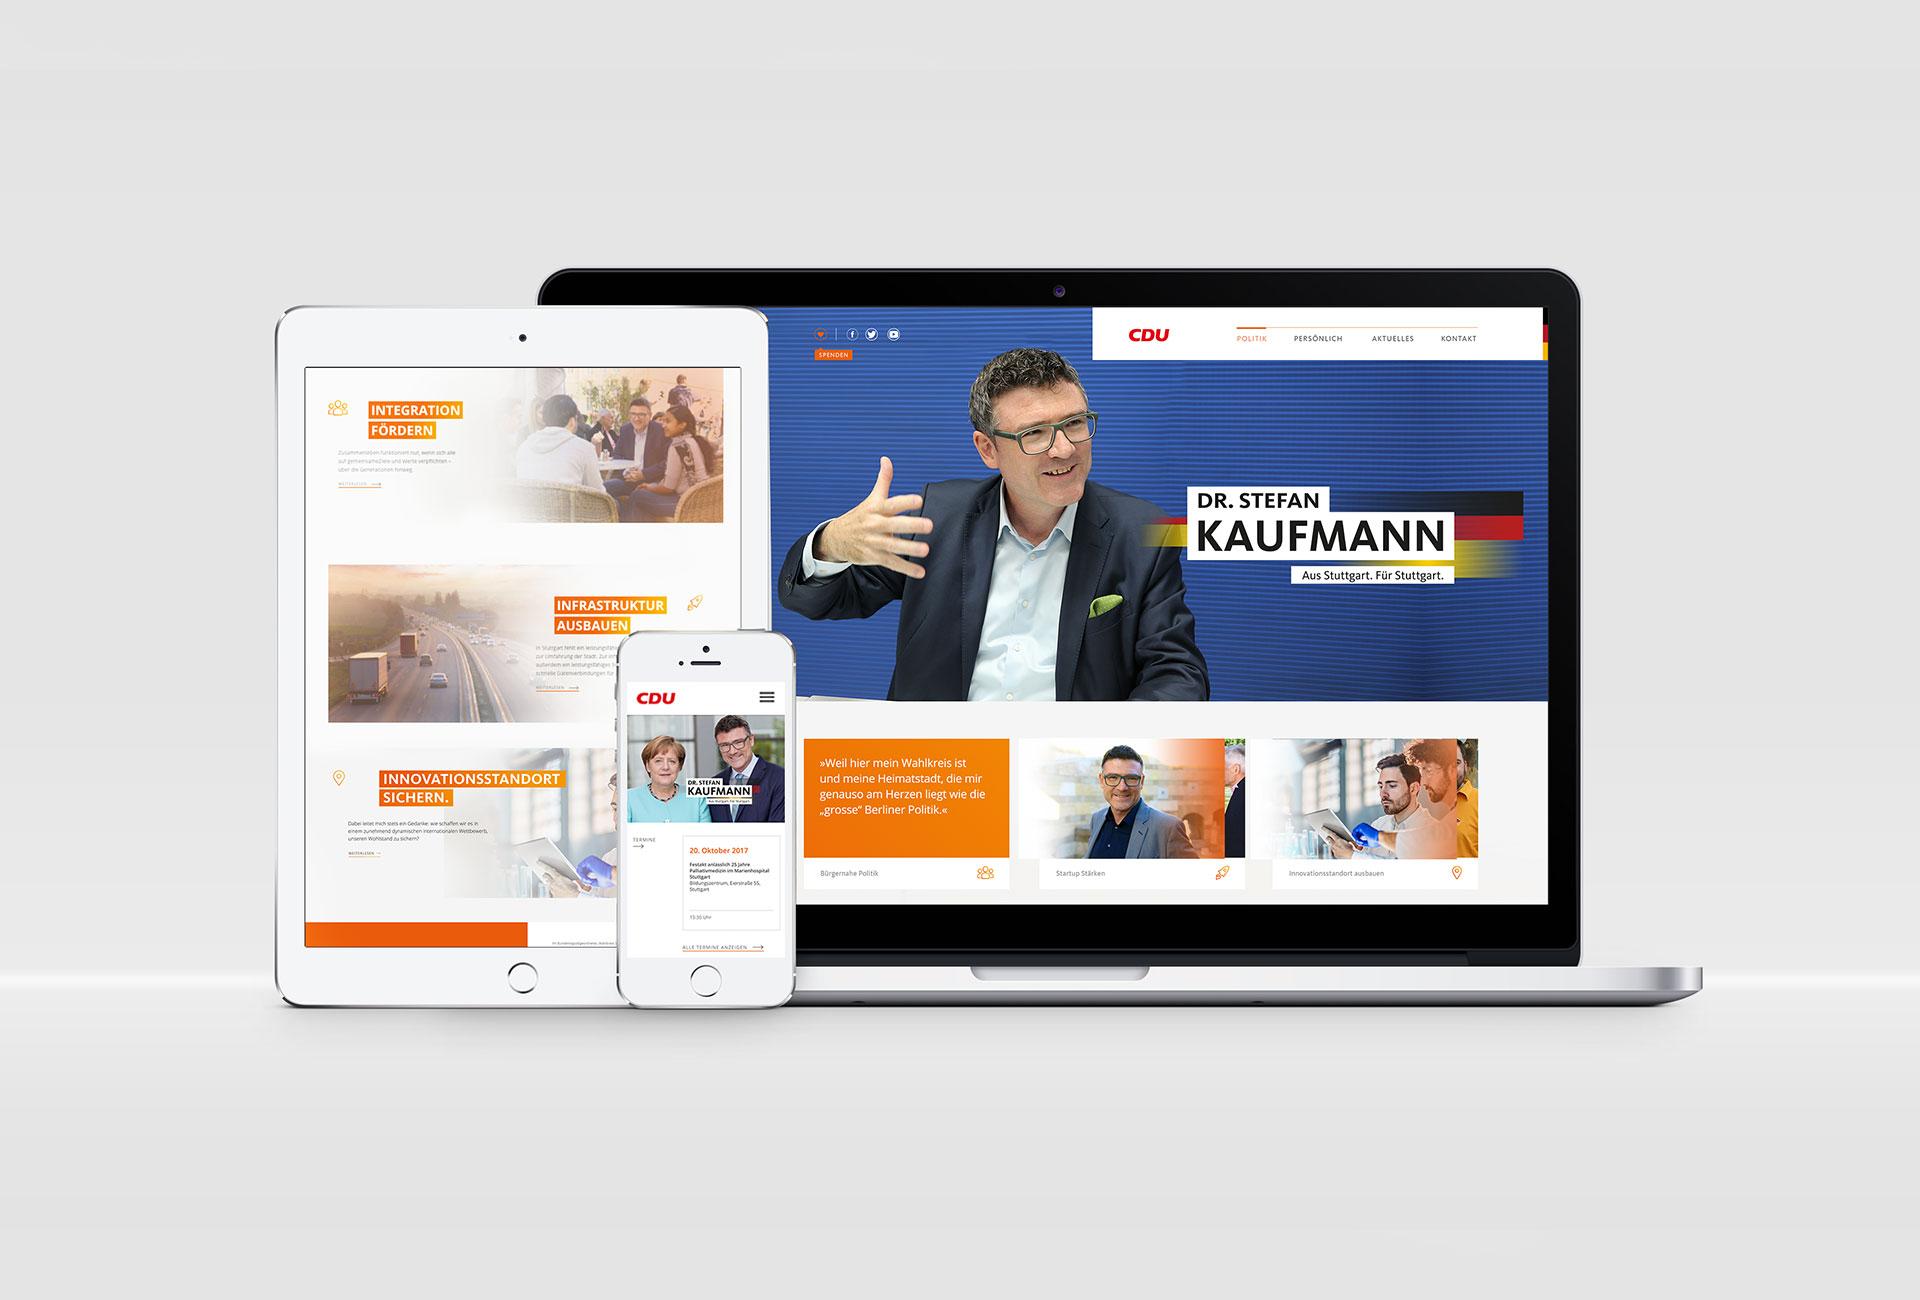 Projekt Stefan Kaufmann Bundestagswahl 2017